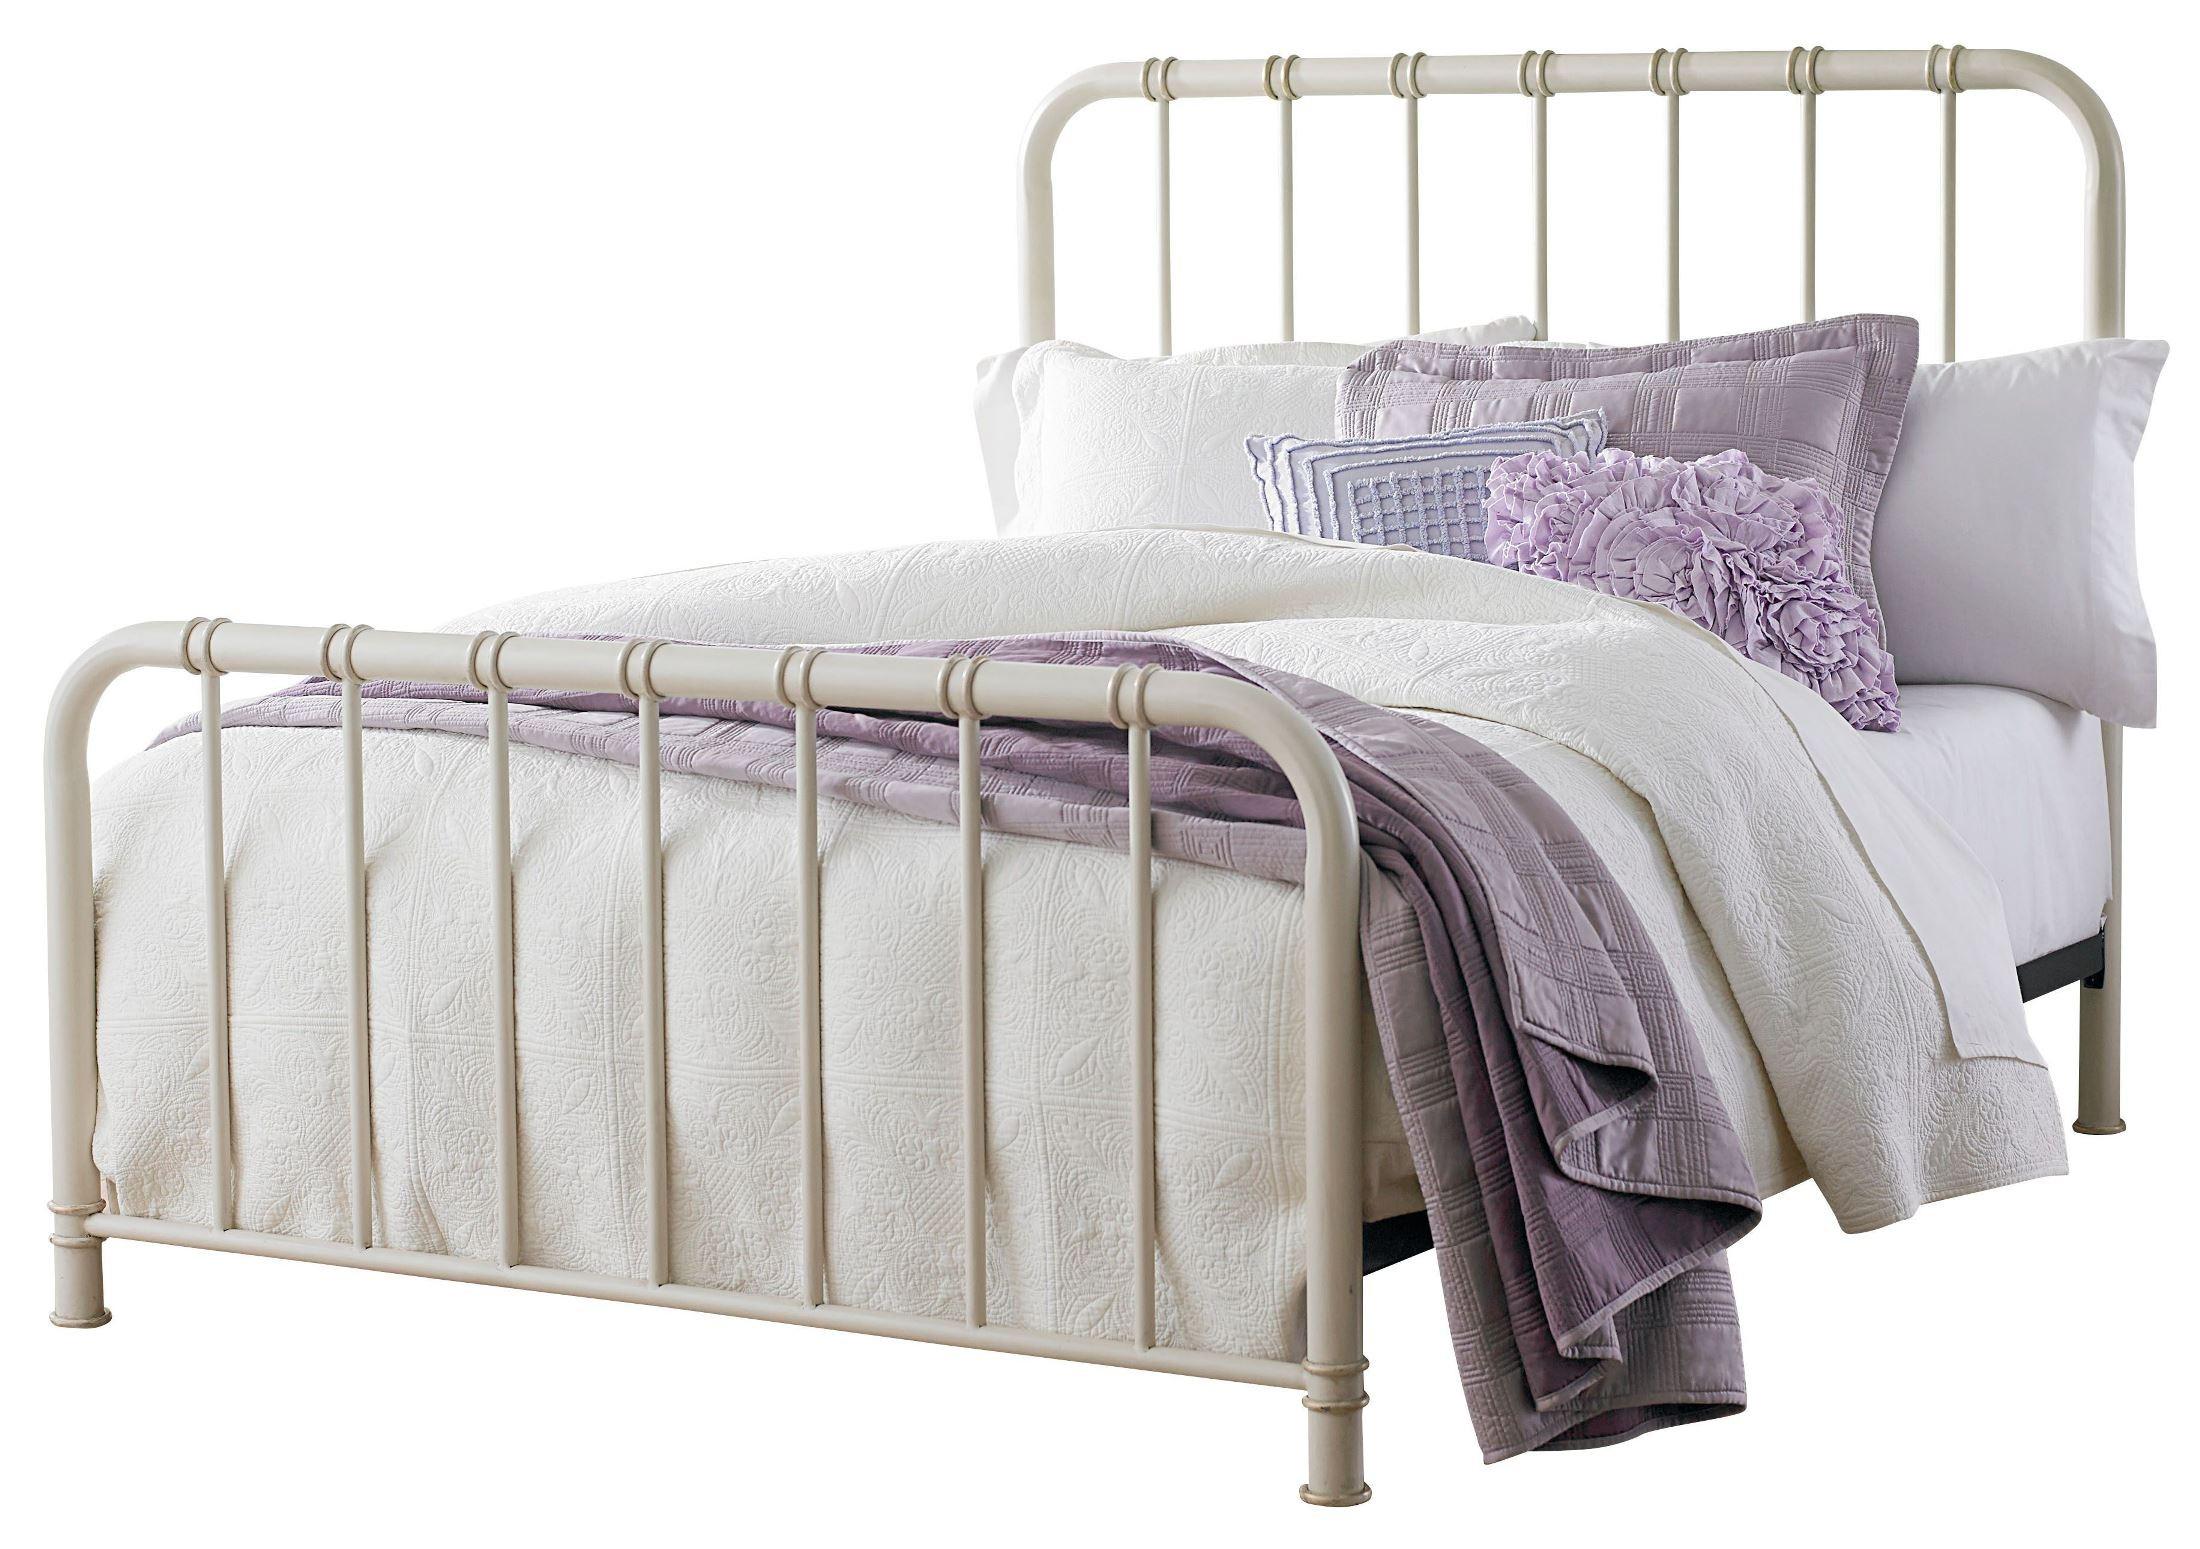 Tristen White Queen Metal Bed From Standard Furniture